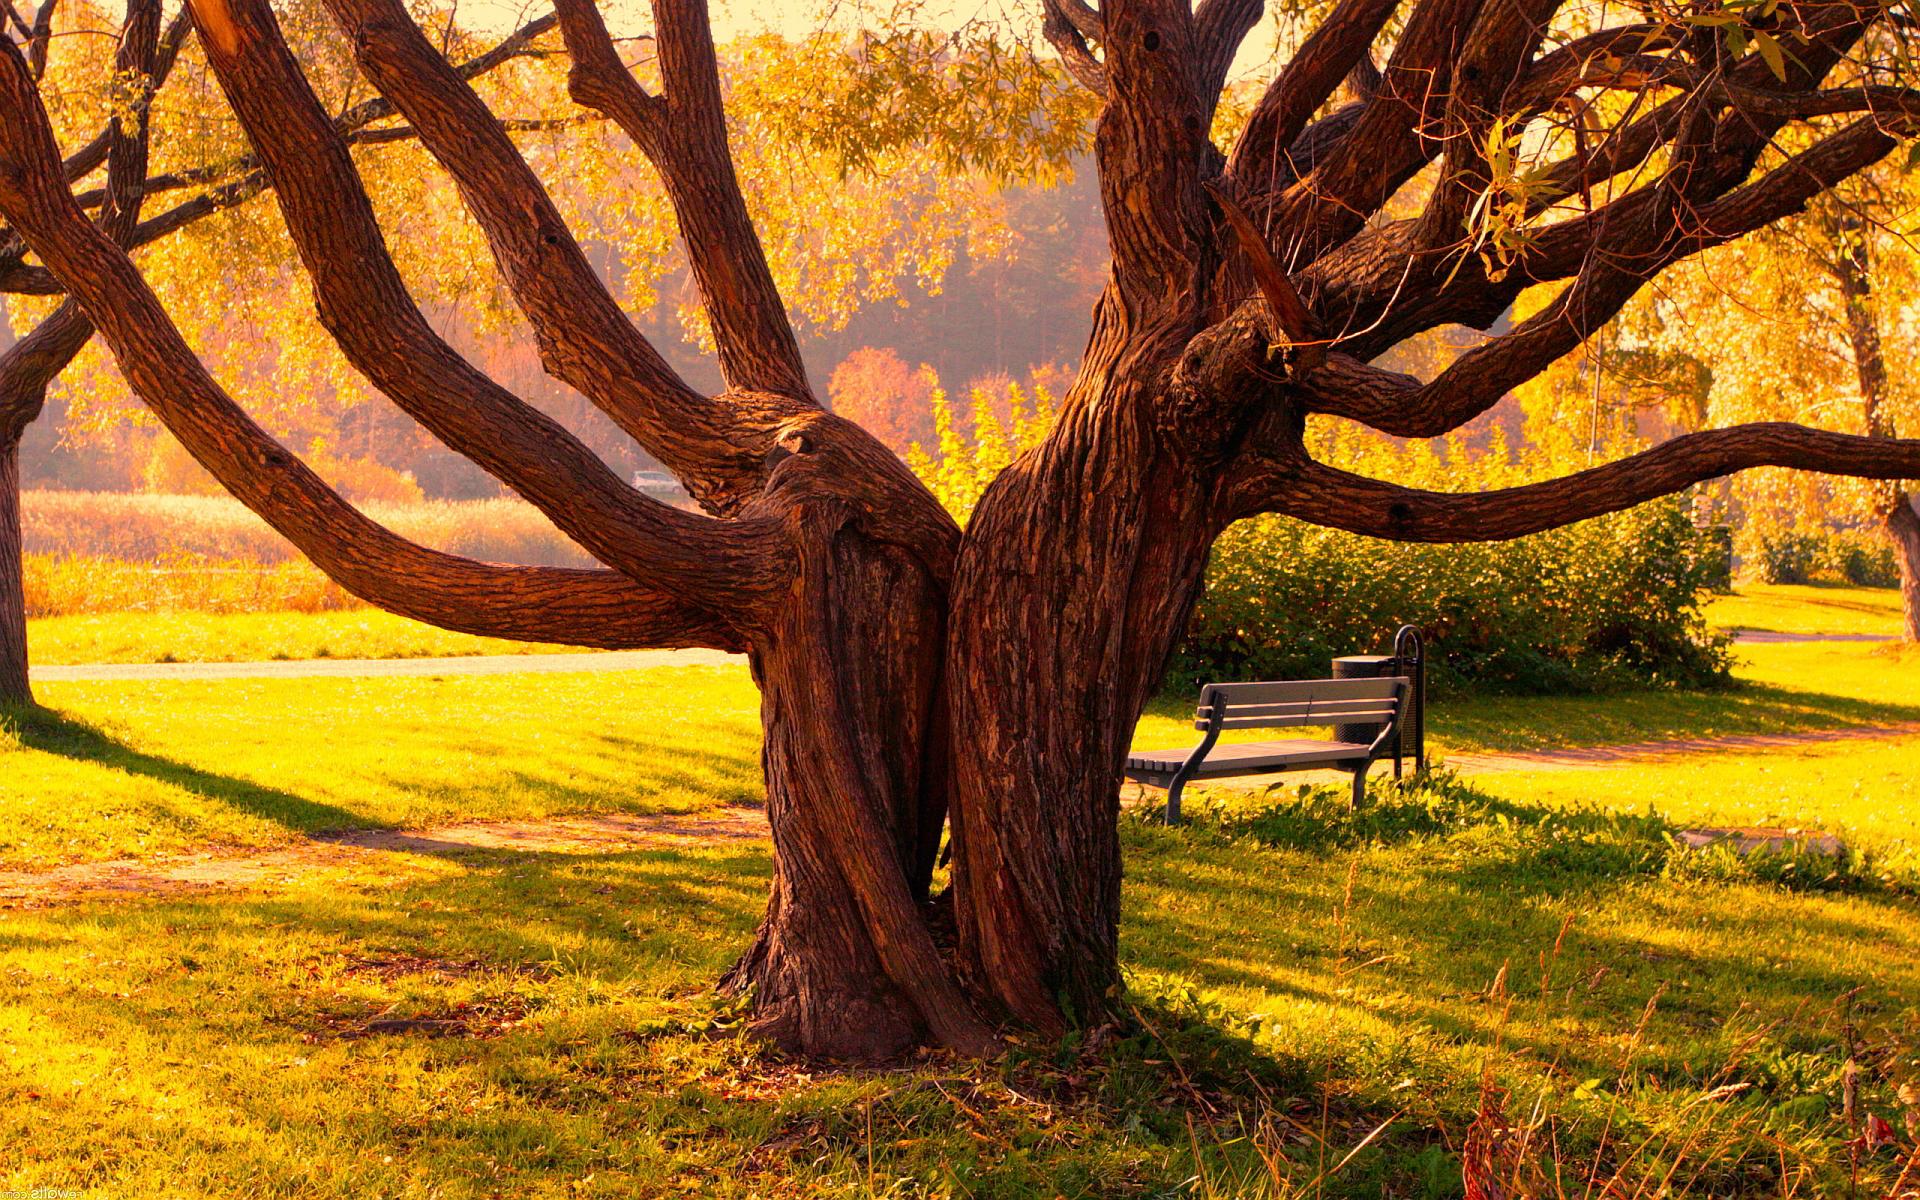 Park old tree